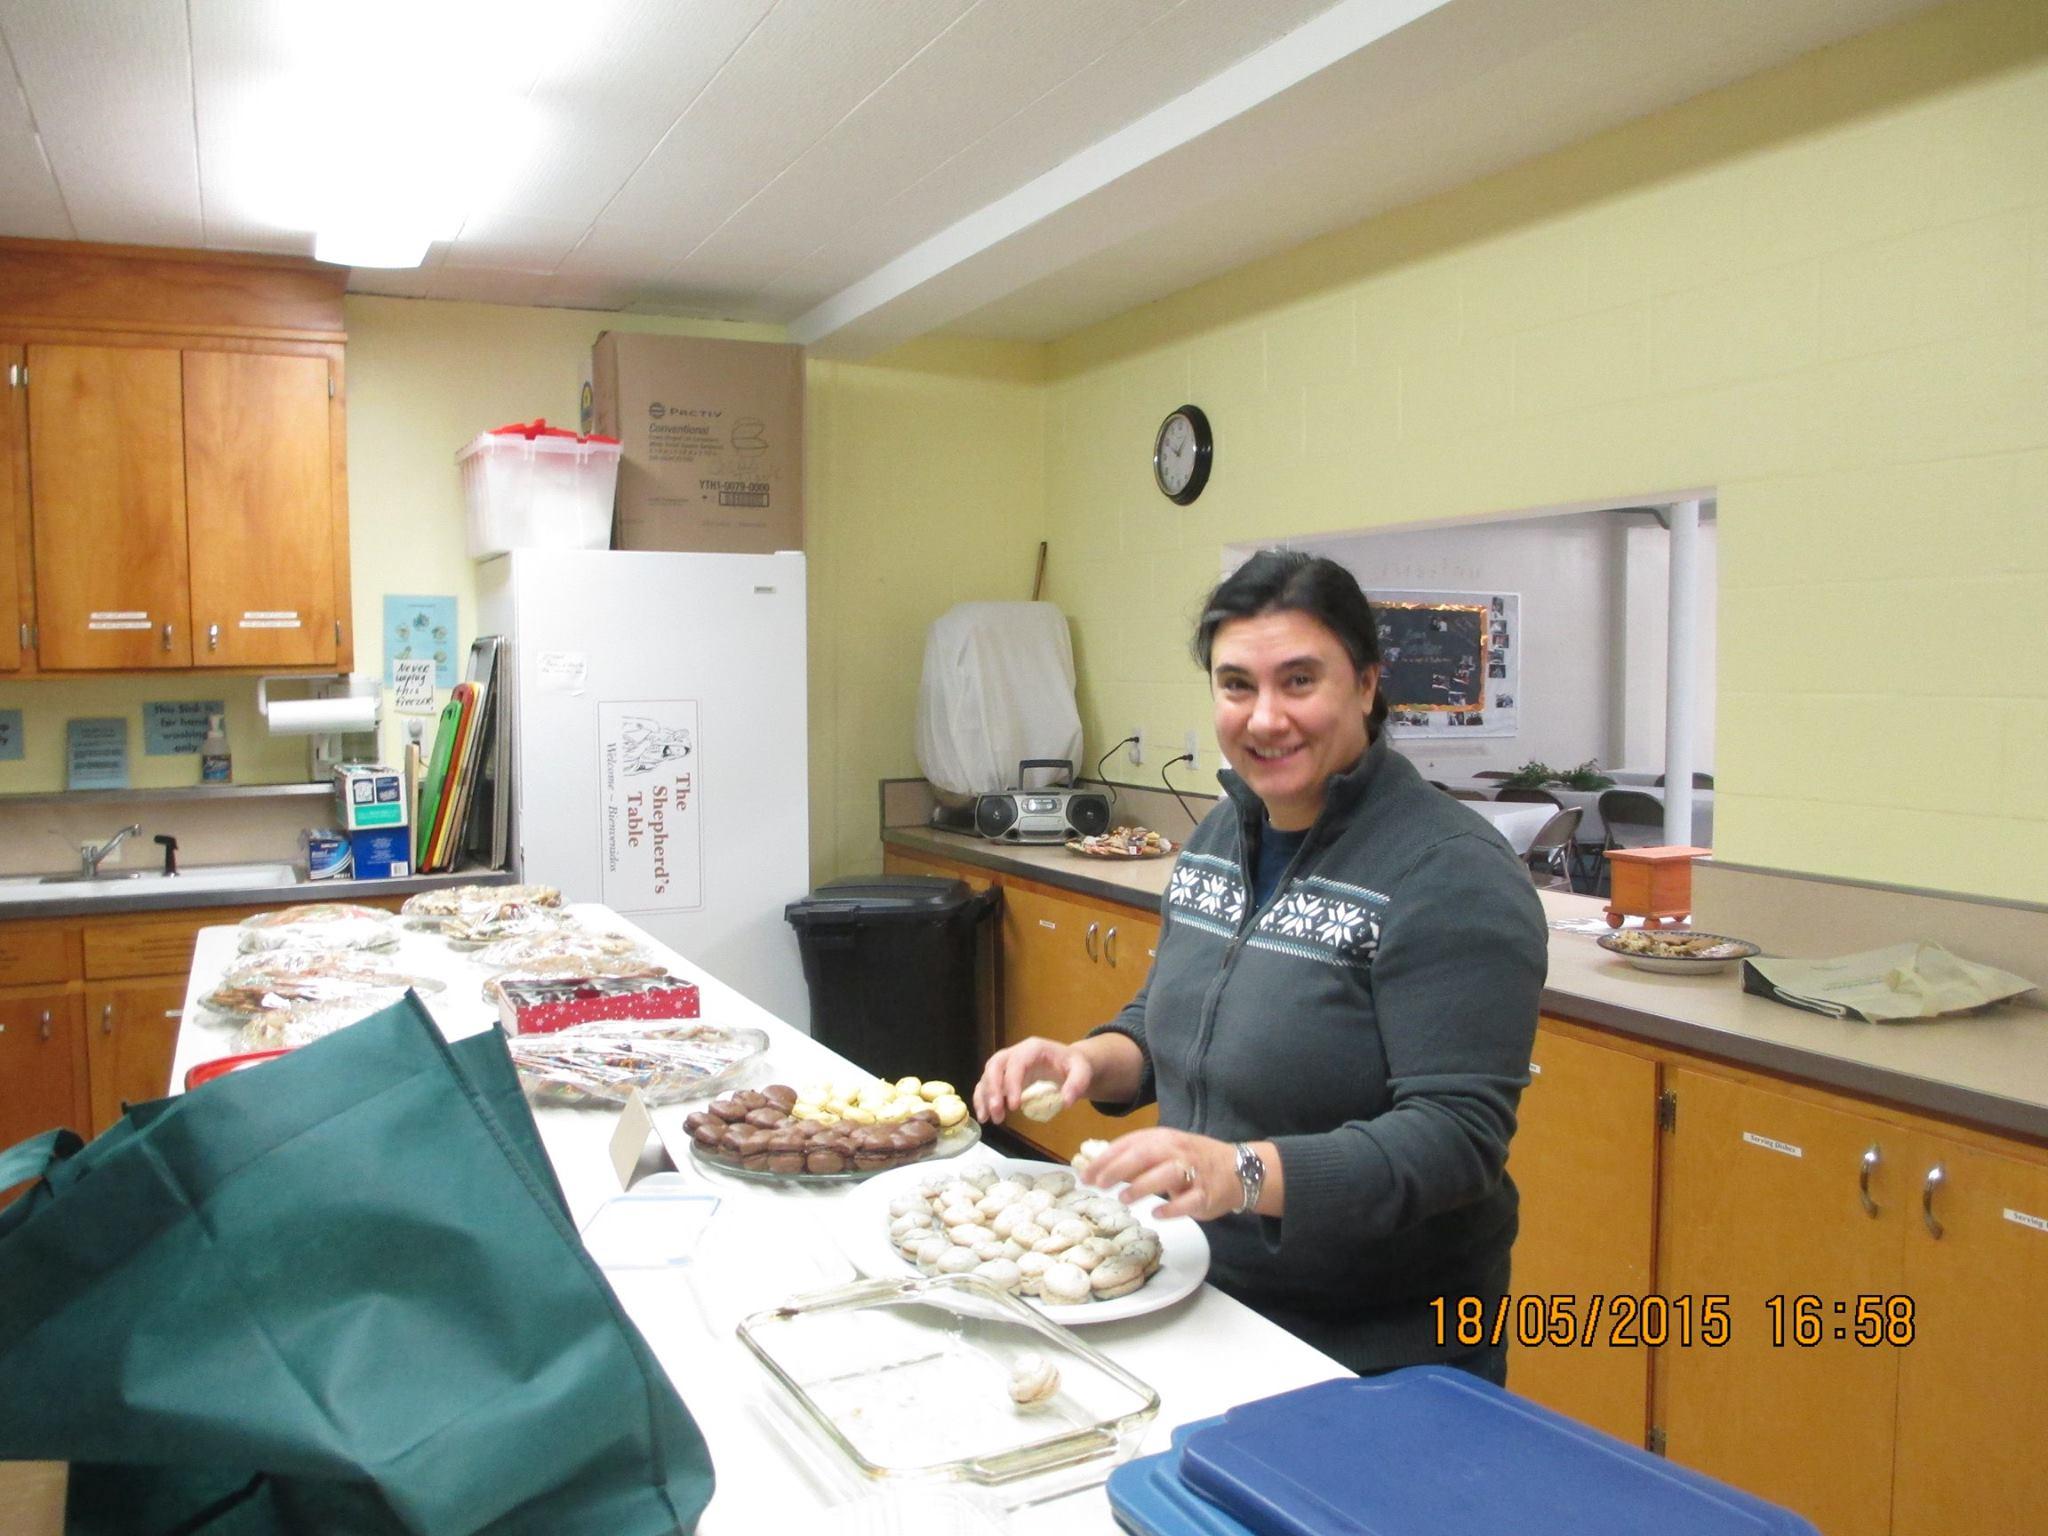 Baking the cookies!